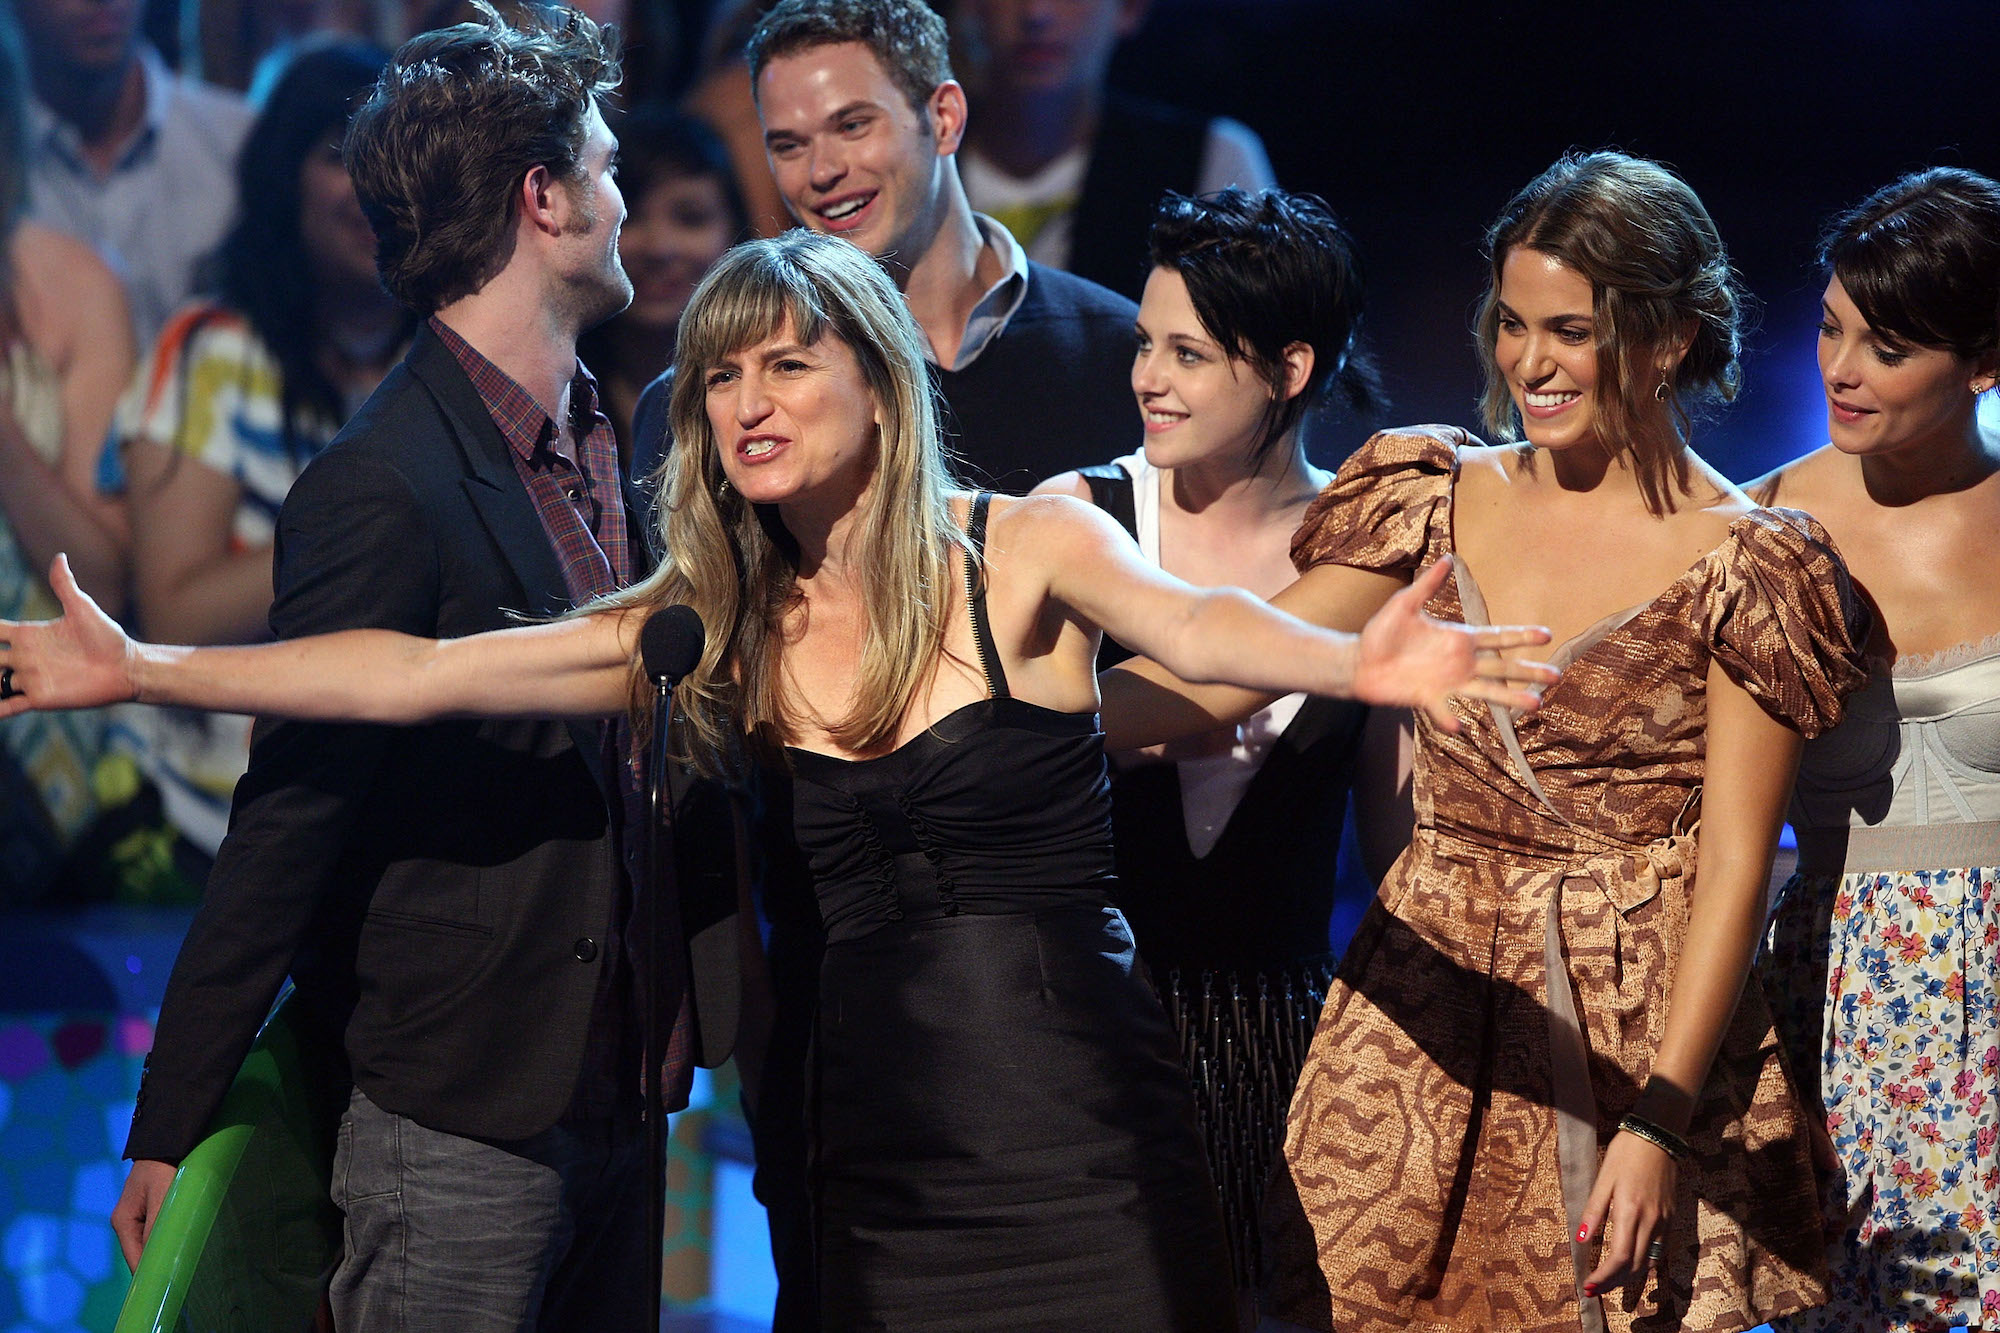 Robert Pattinson, Catherine Hardwicke, Kellan Lutz, Kristen Stewart, Nikki Reed and Ashley Greene onstage during the Teen Choice Awards 2009